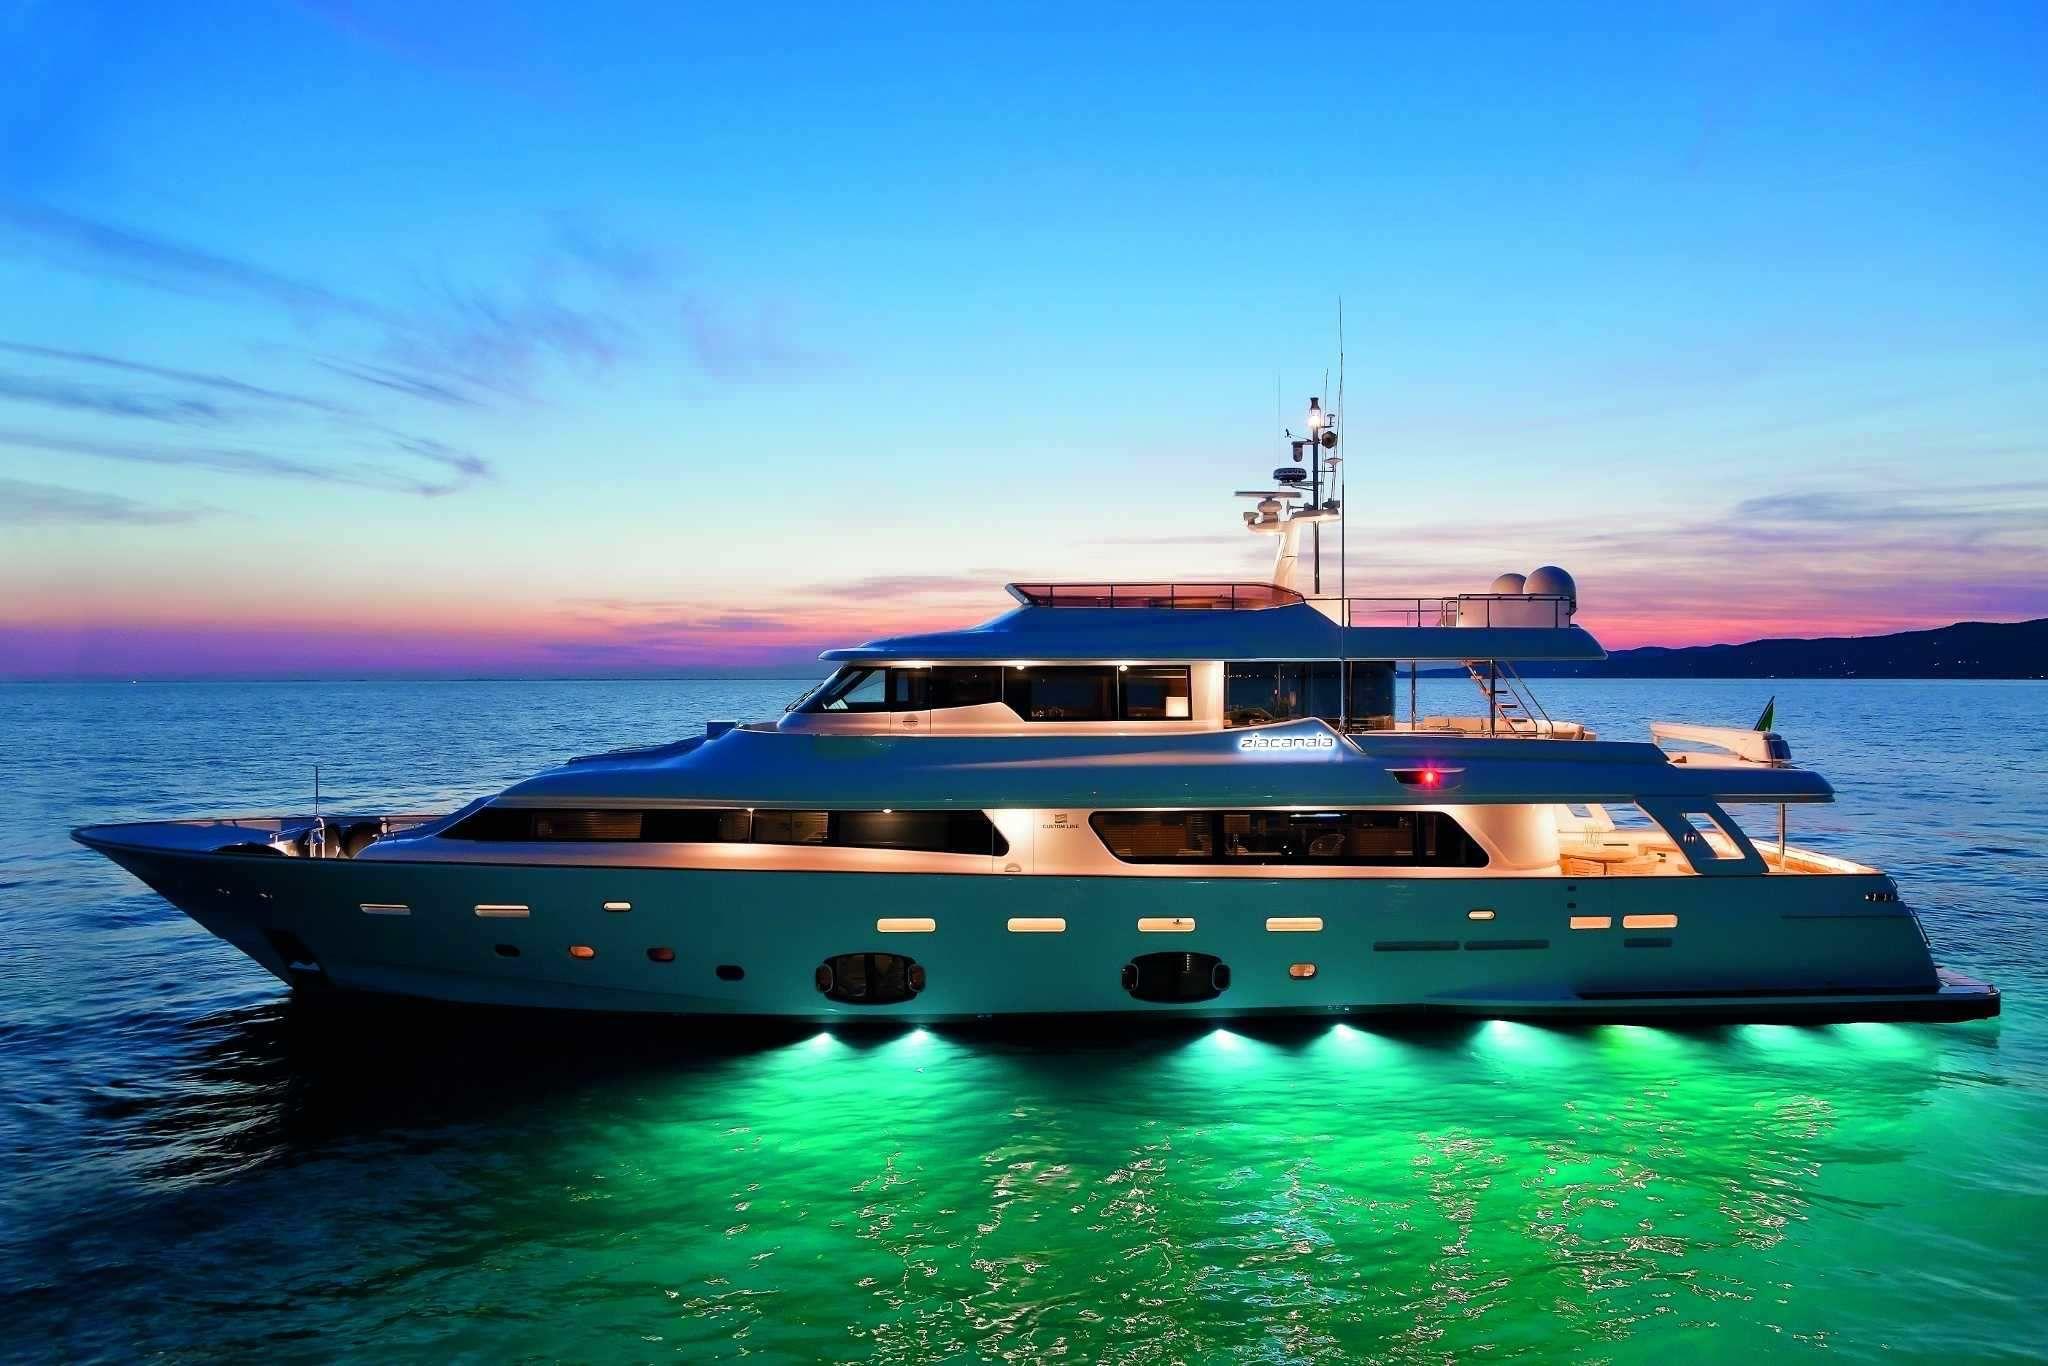 luxury yachts   My World   Pinterest   Luxury yachts, Luxury yacht ...